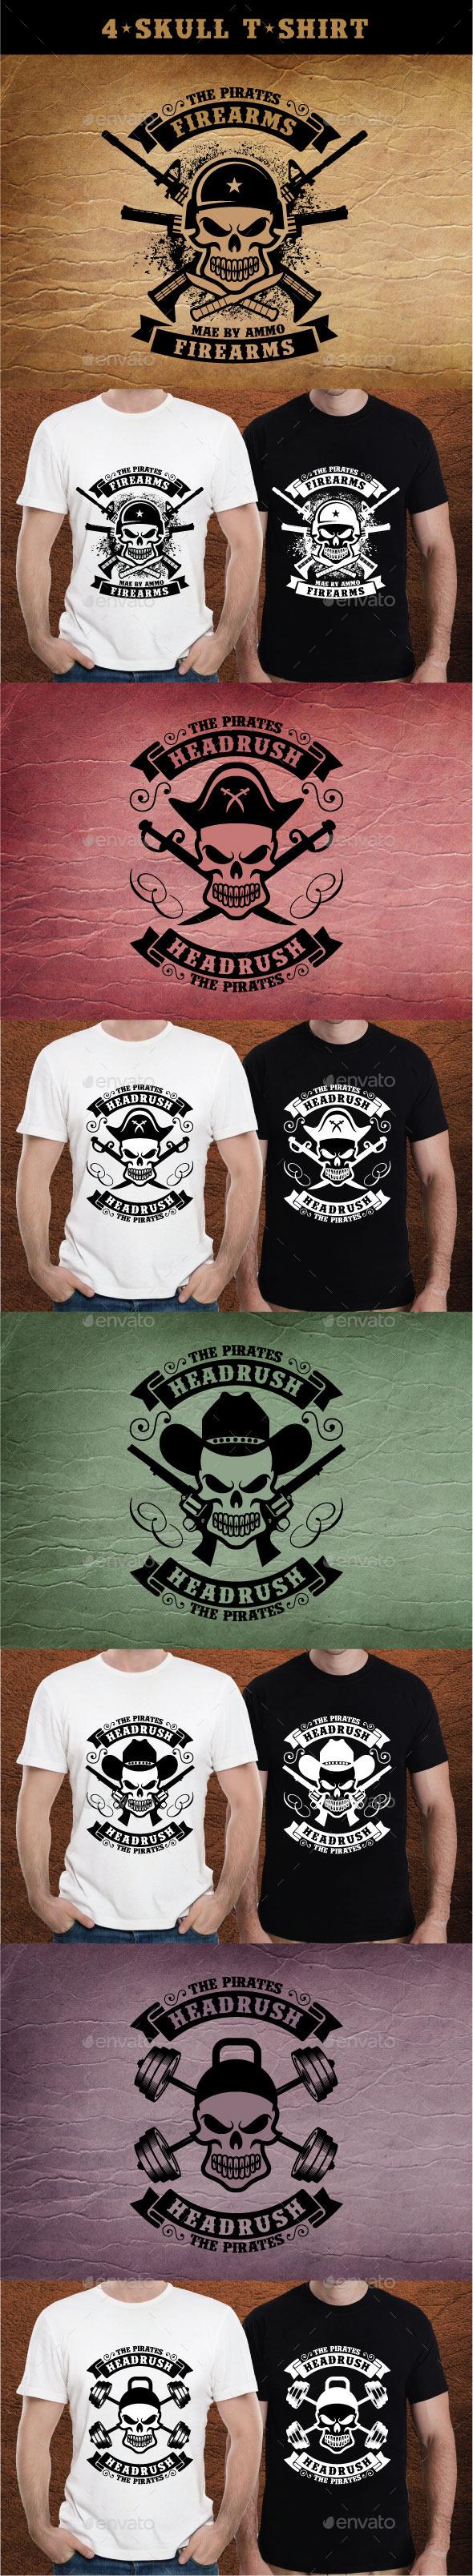 4-Skull T-Shirt - Grunge Designs